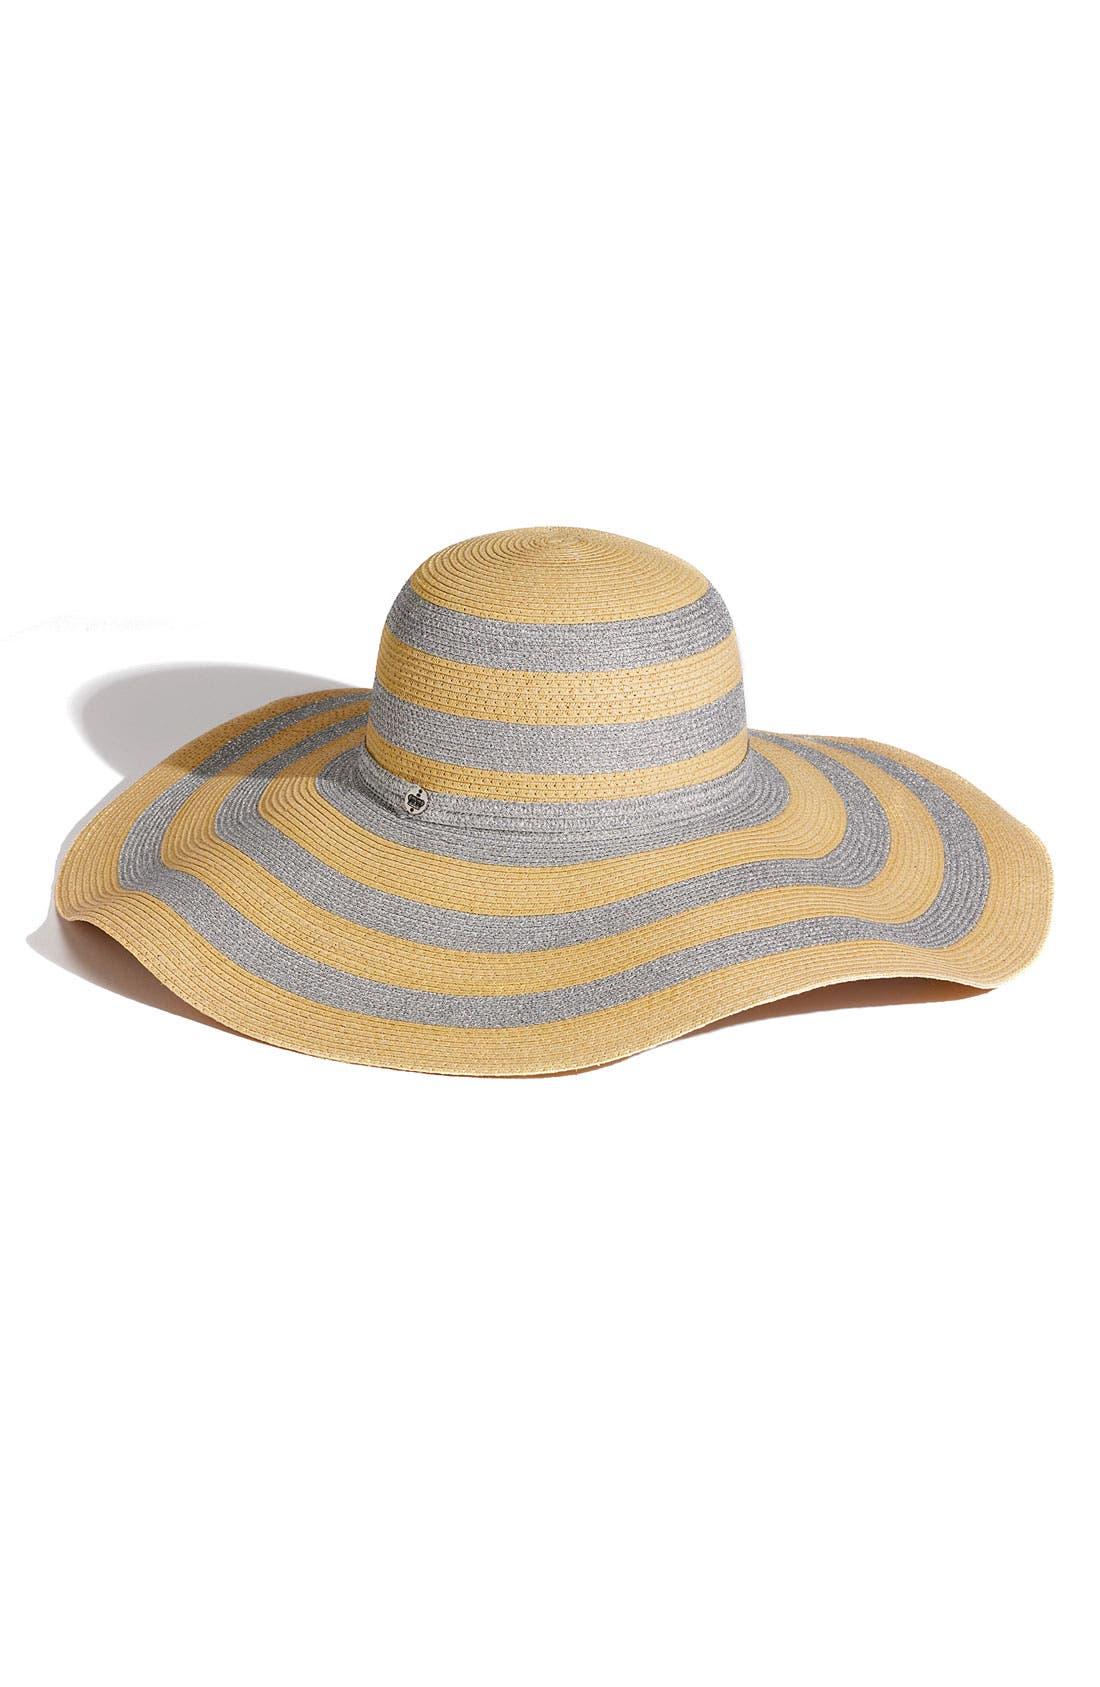 Stripe Floppy Paper Straw Hat,                             Main thumbnail 1, color,                             102